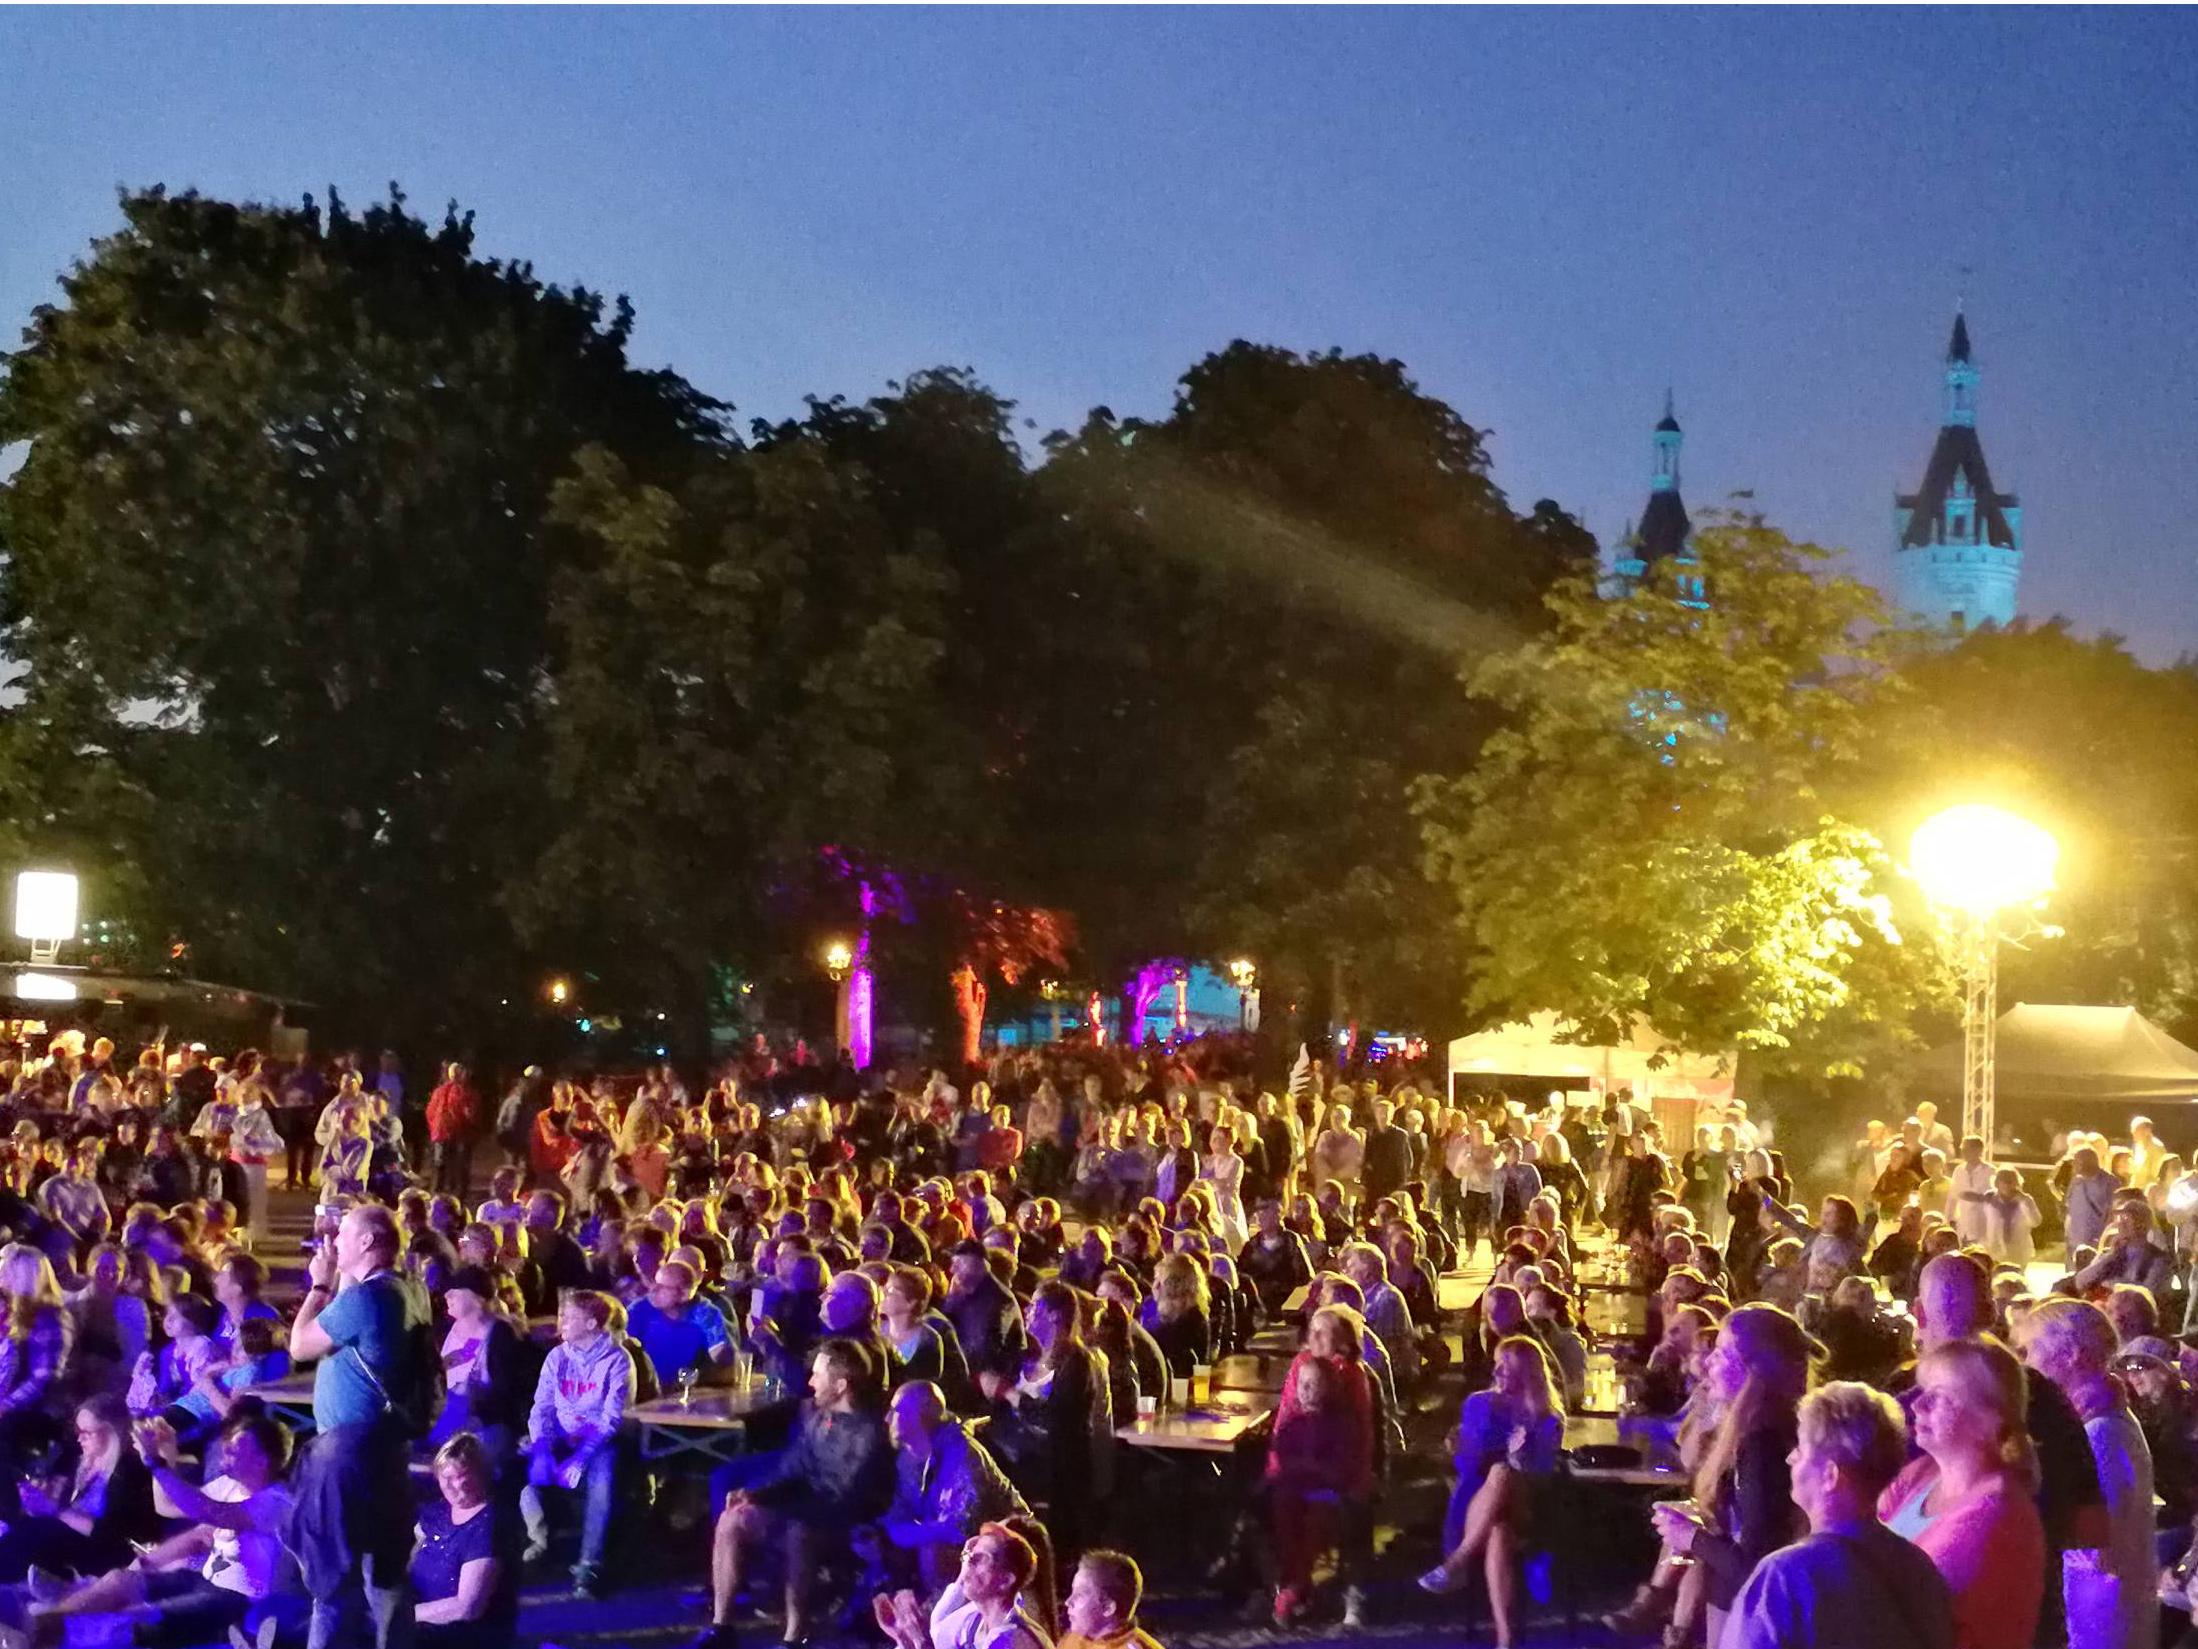 Schlossgartenlust 2019 | Foto: privat